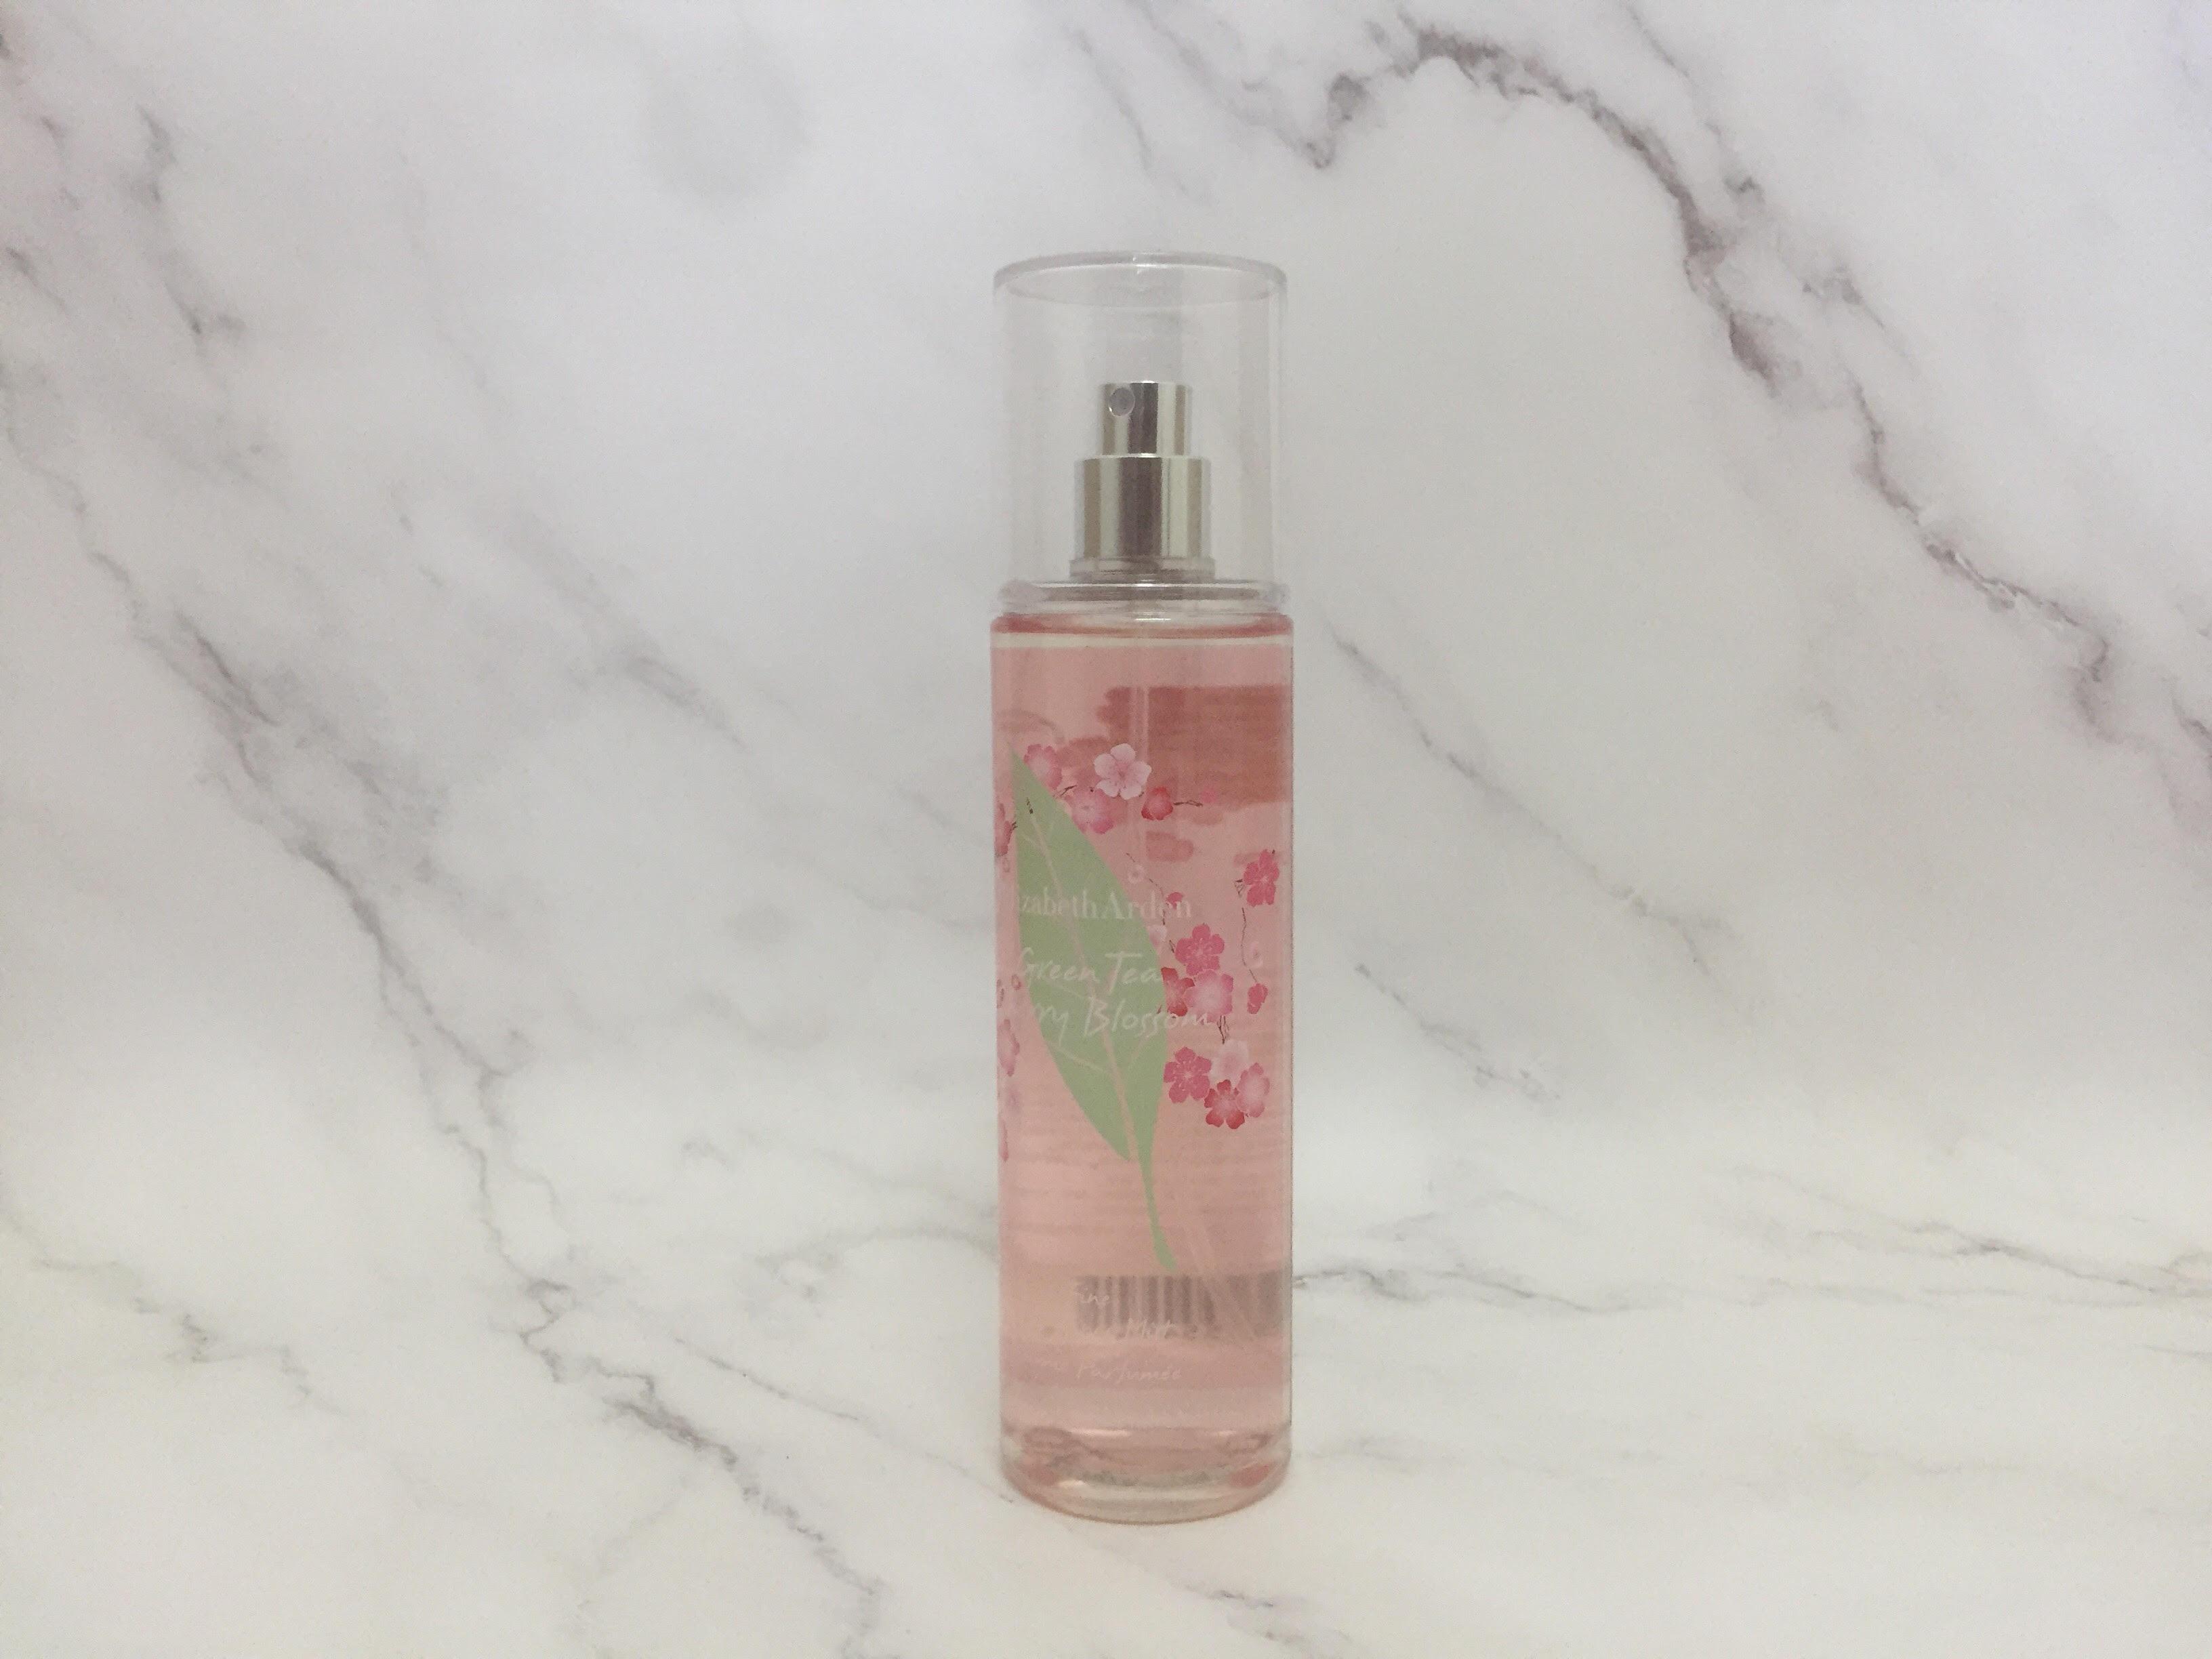 REVIEW   Elizabeth Arden Green Tea Cherry Blossom Fine Fragrance Mist